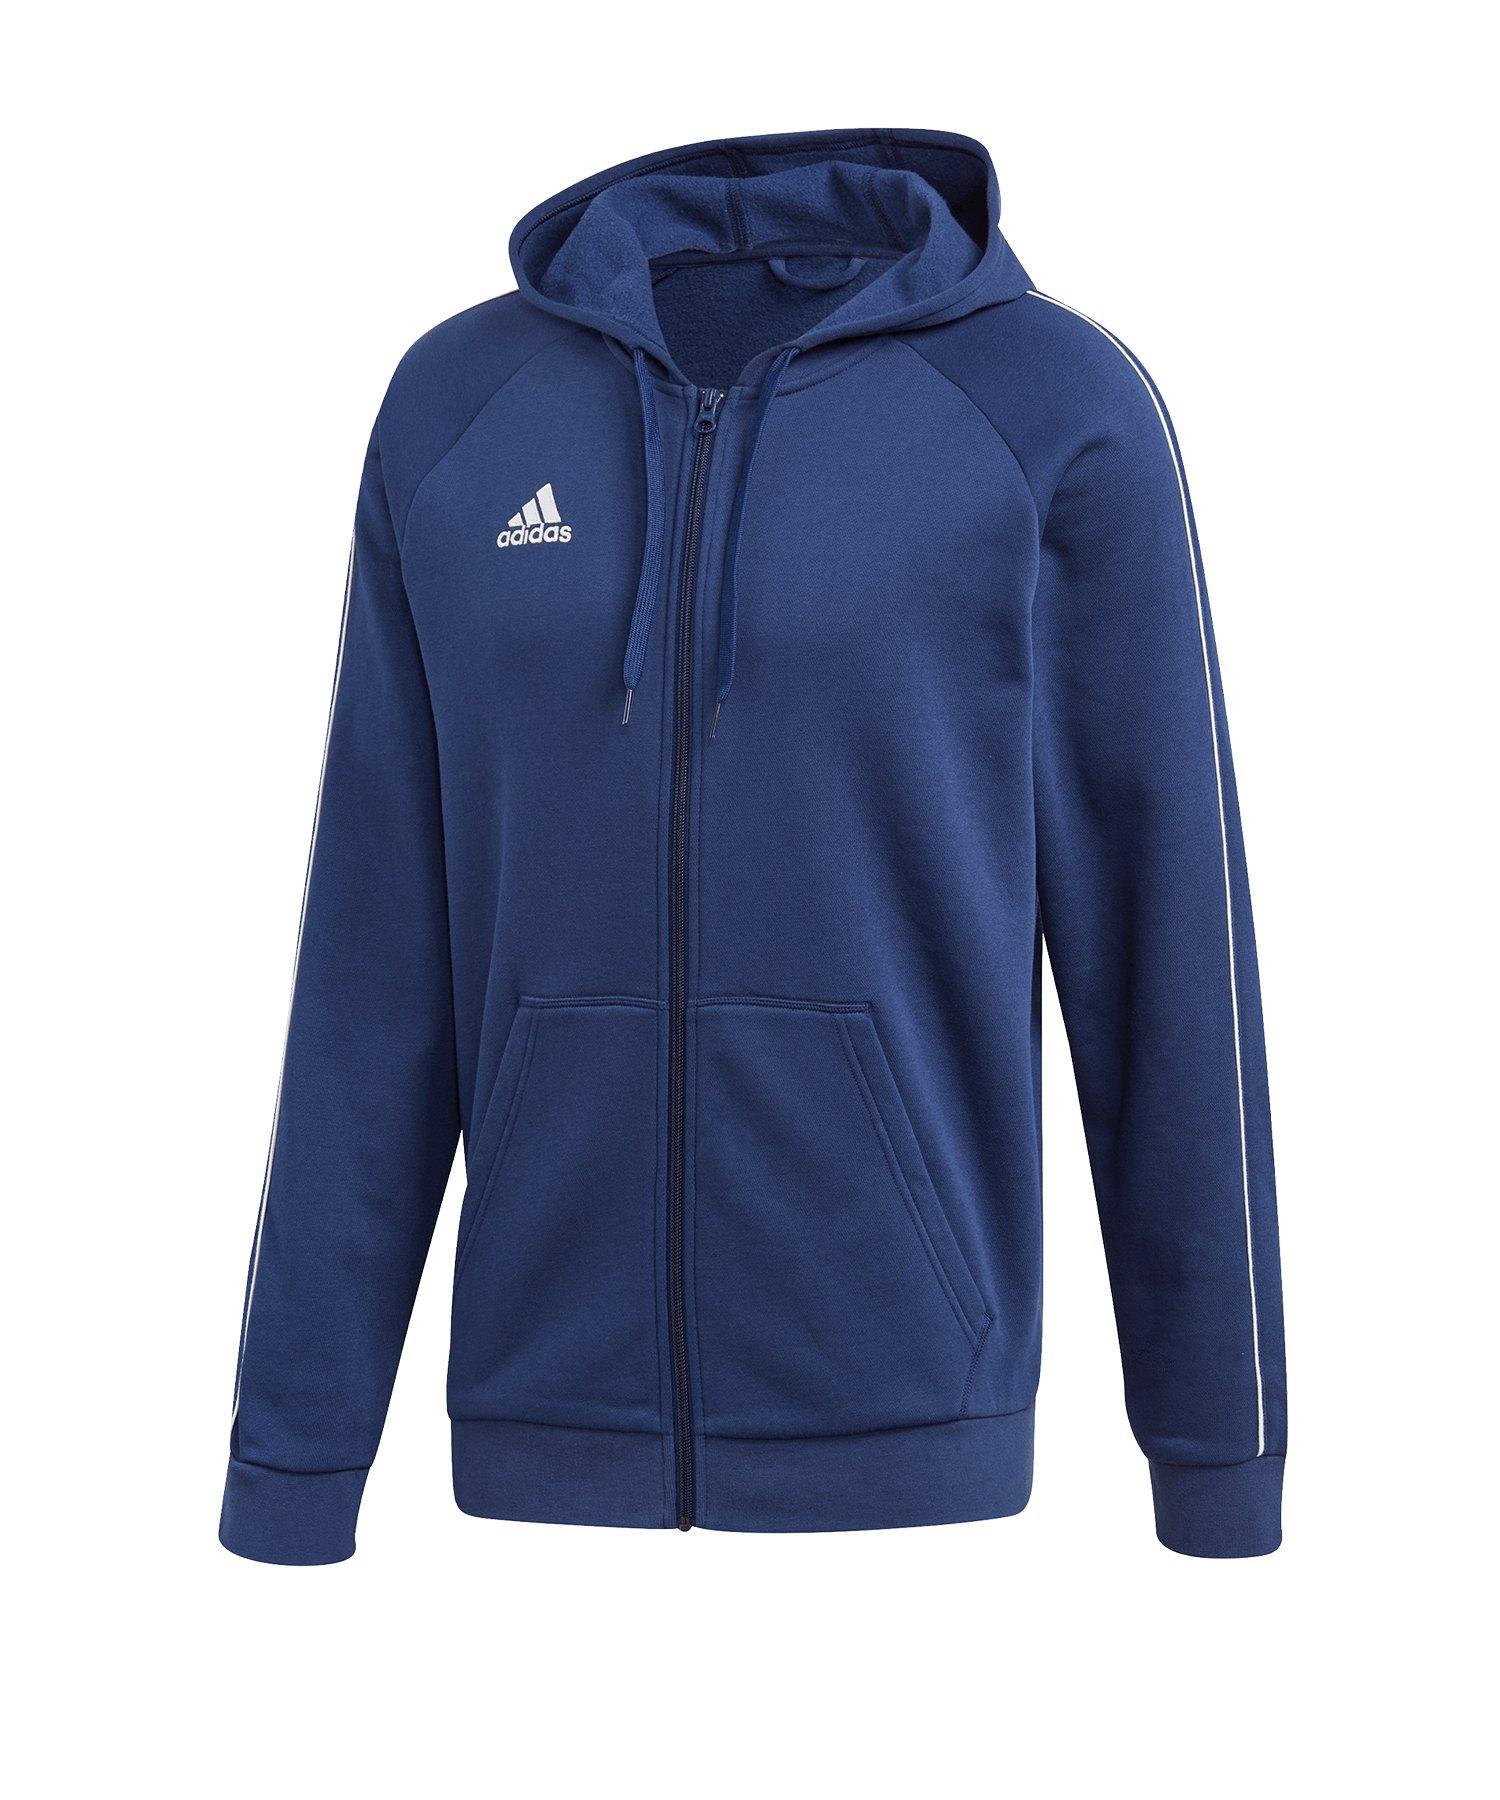 adidas Core 18 Kapuzenjacke Blau Weiss - blau